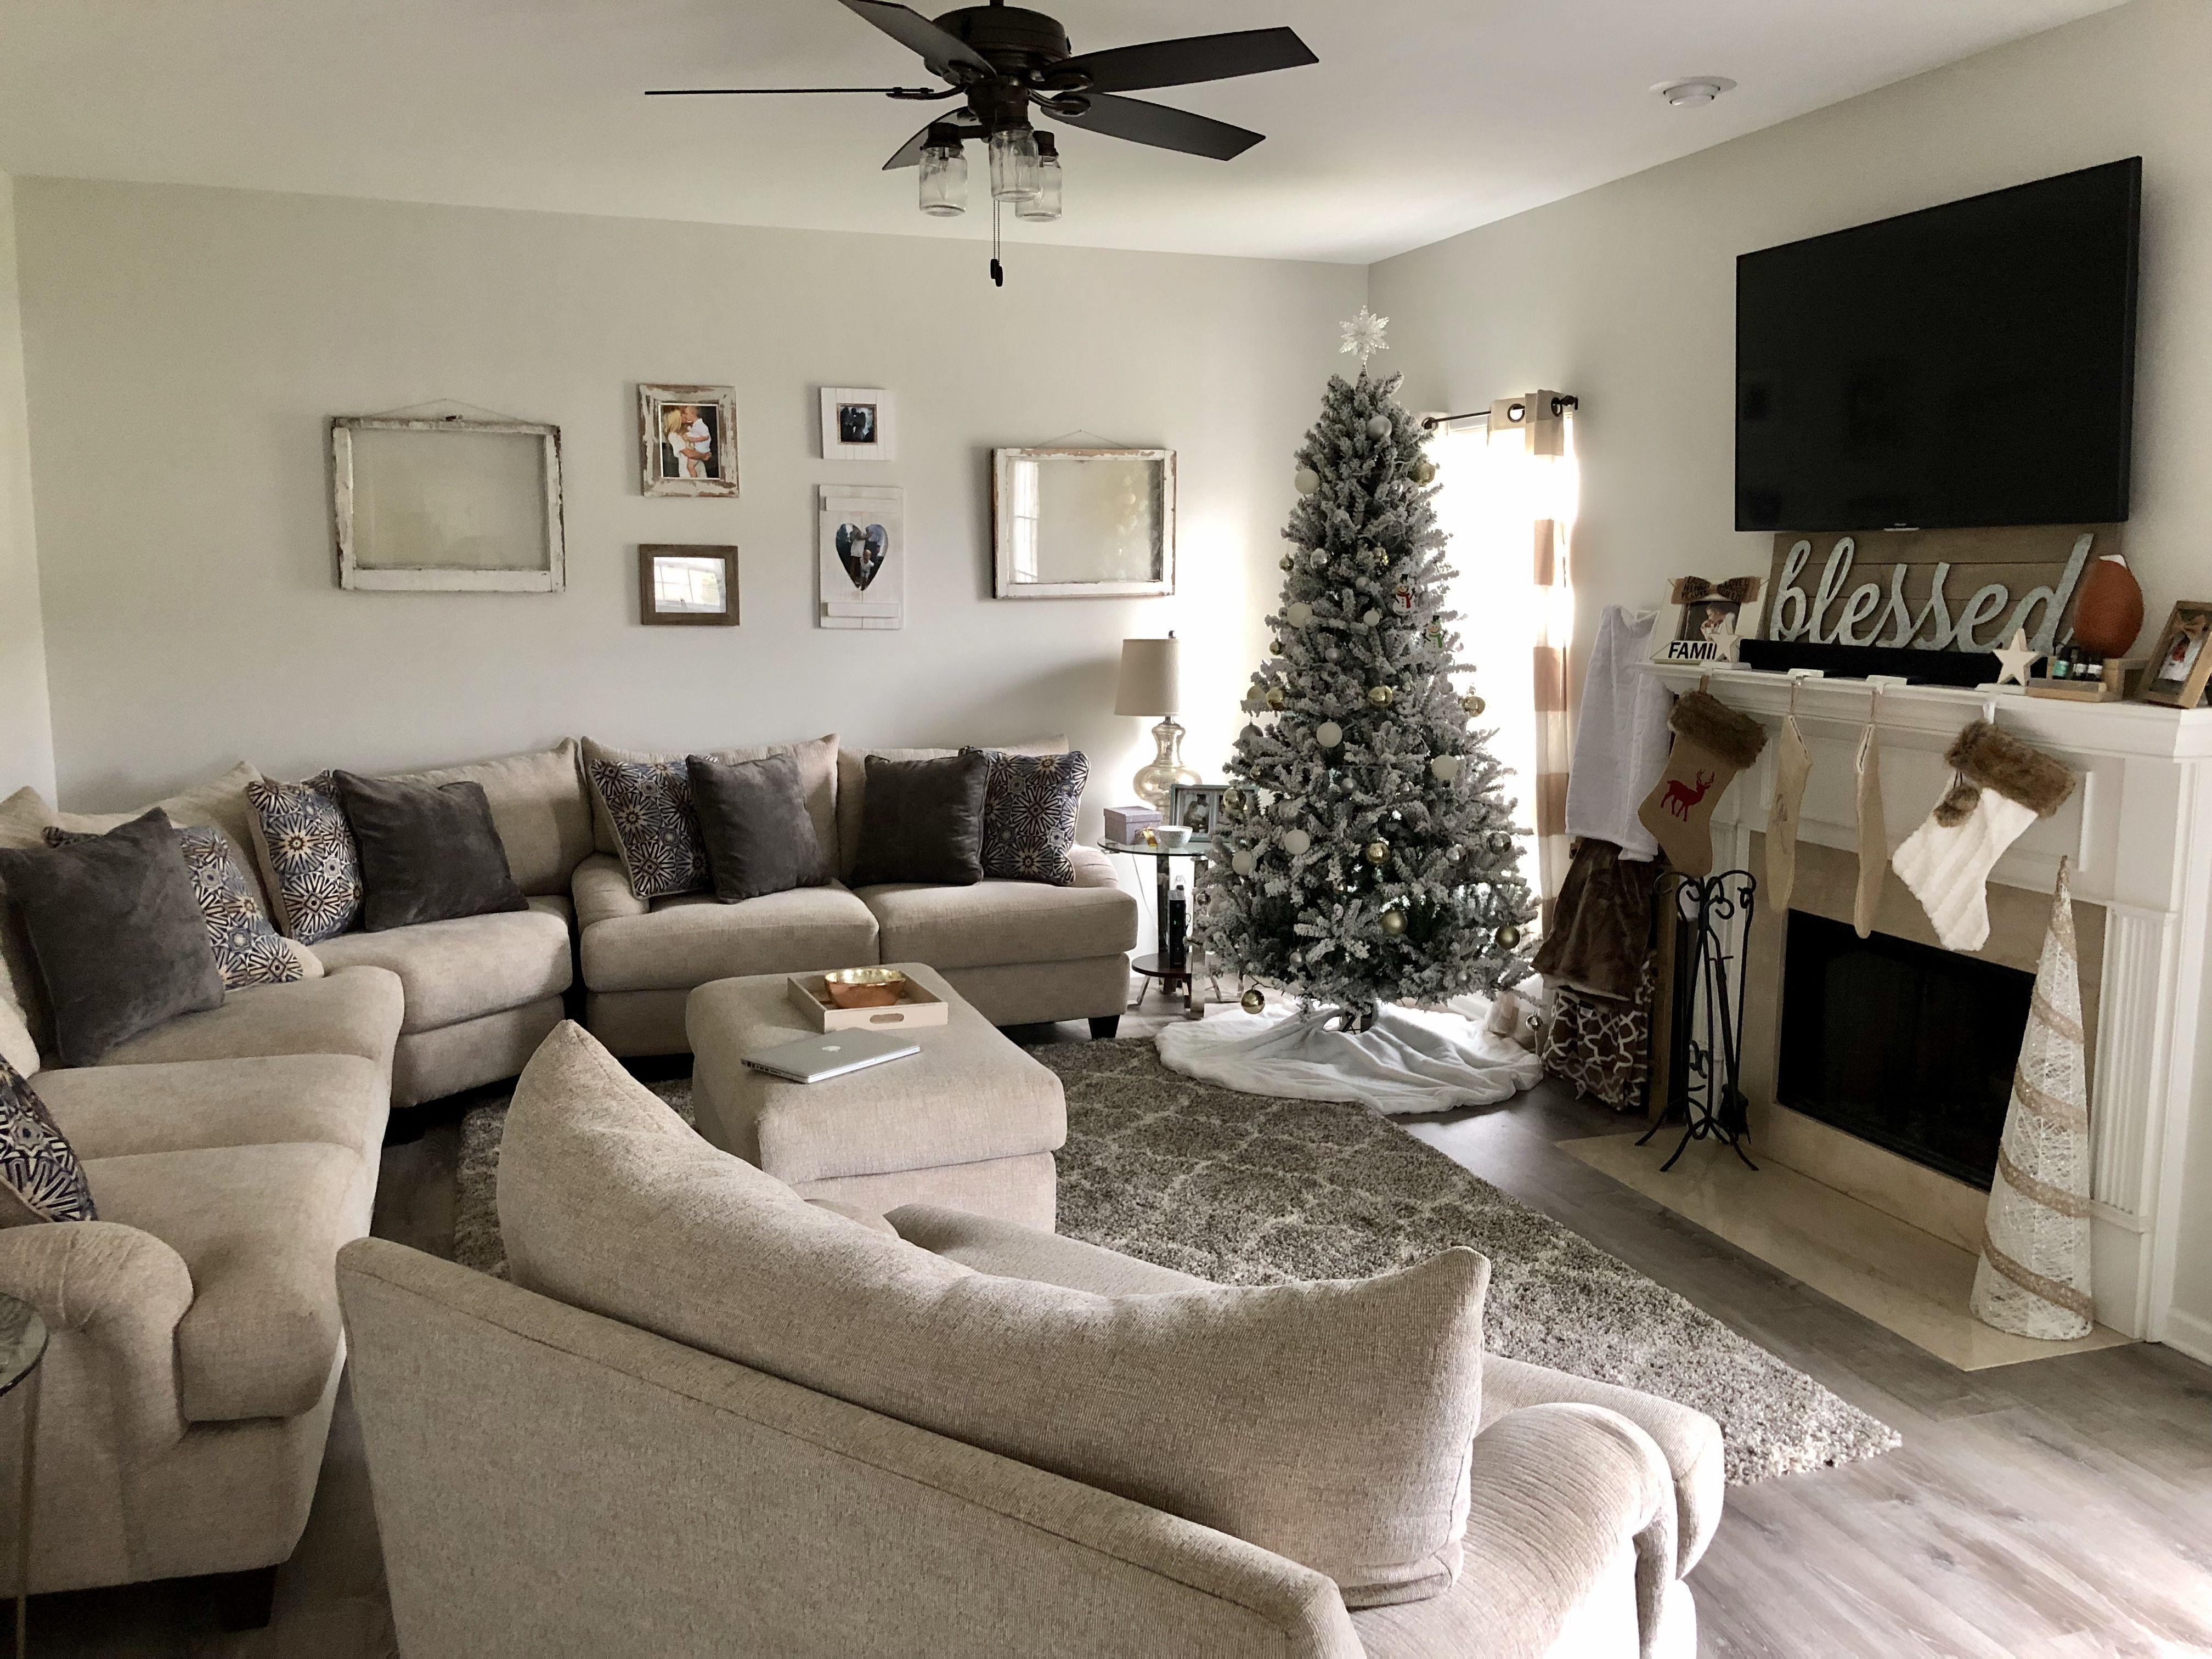 White Farmhouse Living Room Farm House Living Room White Living Room Room #rustic #gray #living #room